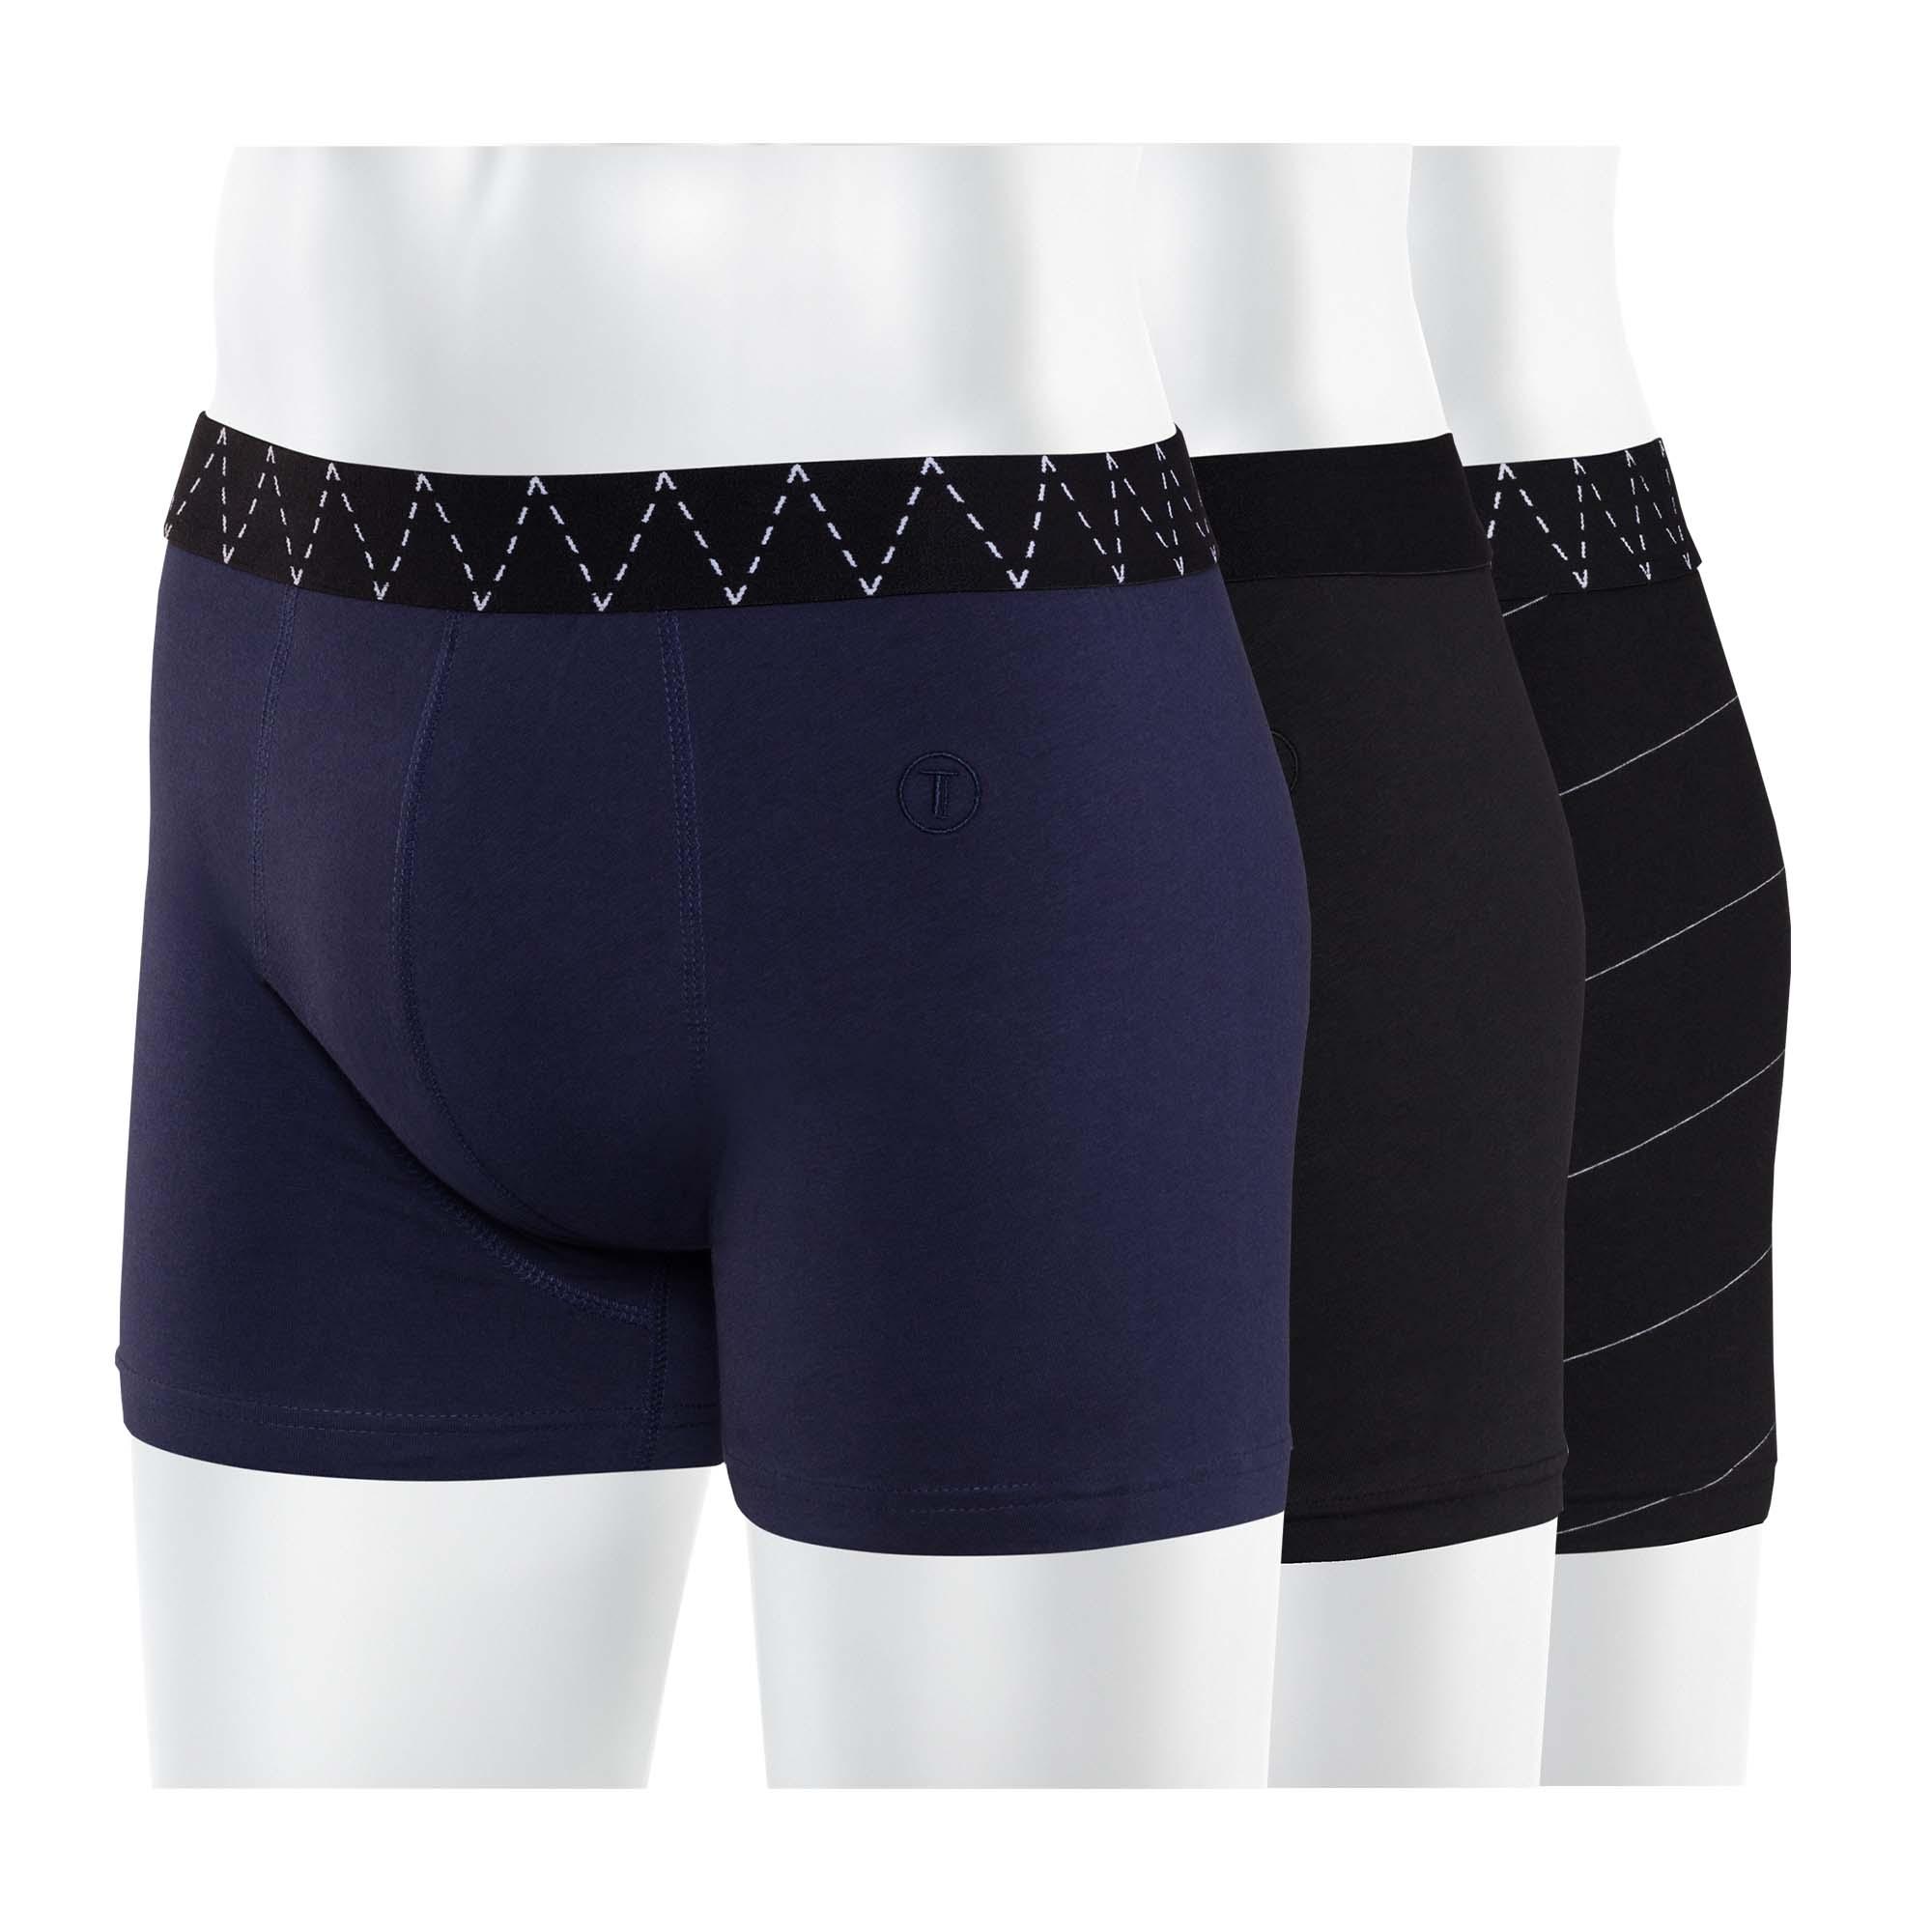 3er Pack TT15 Boxershorts Midnight/Black/Microstripes GOTS & Fairtrade